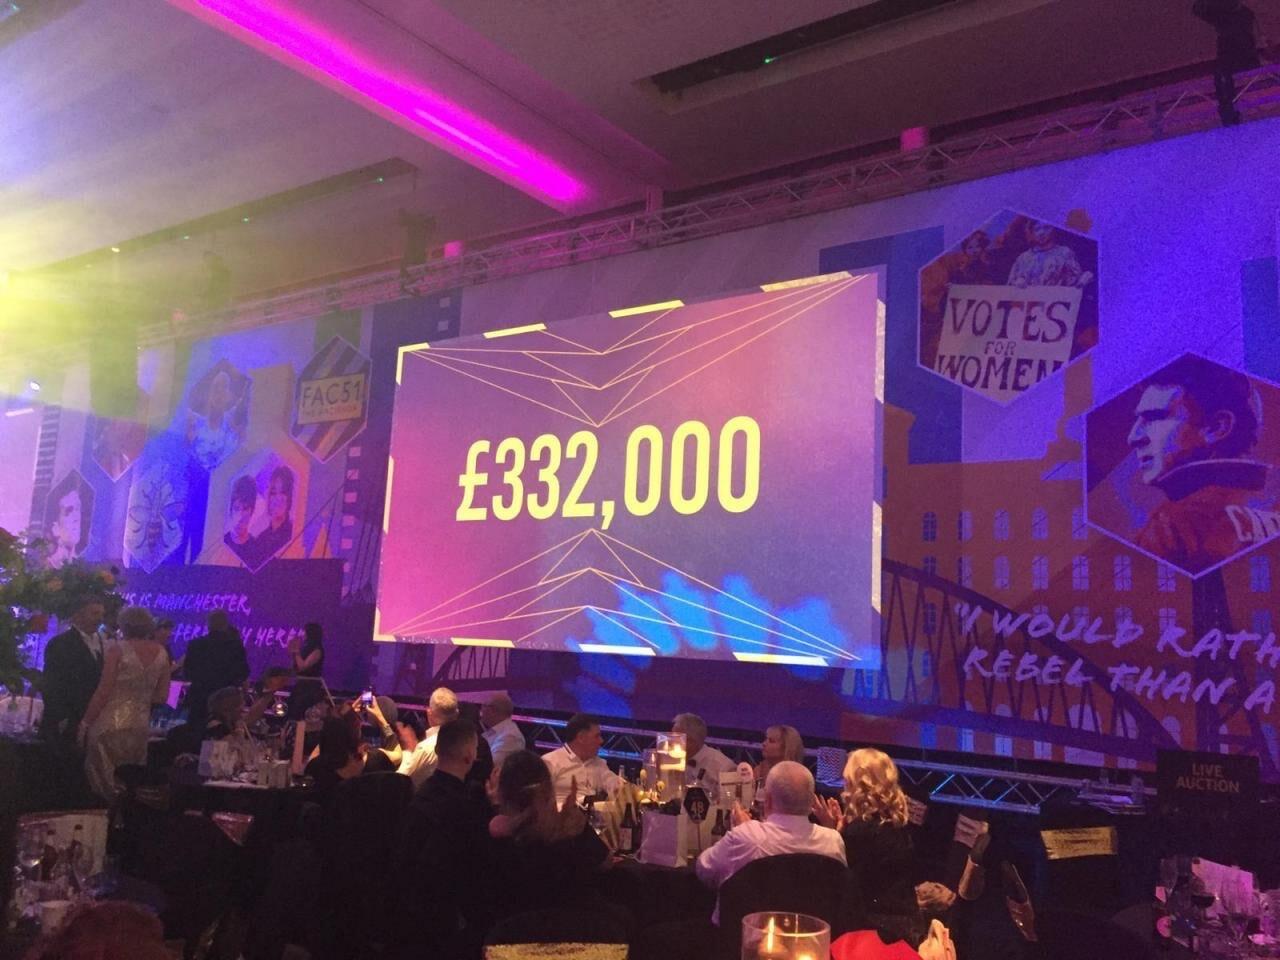 money raised at The Ronald McDonald House Charities Manchester Gala